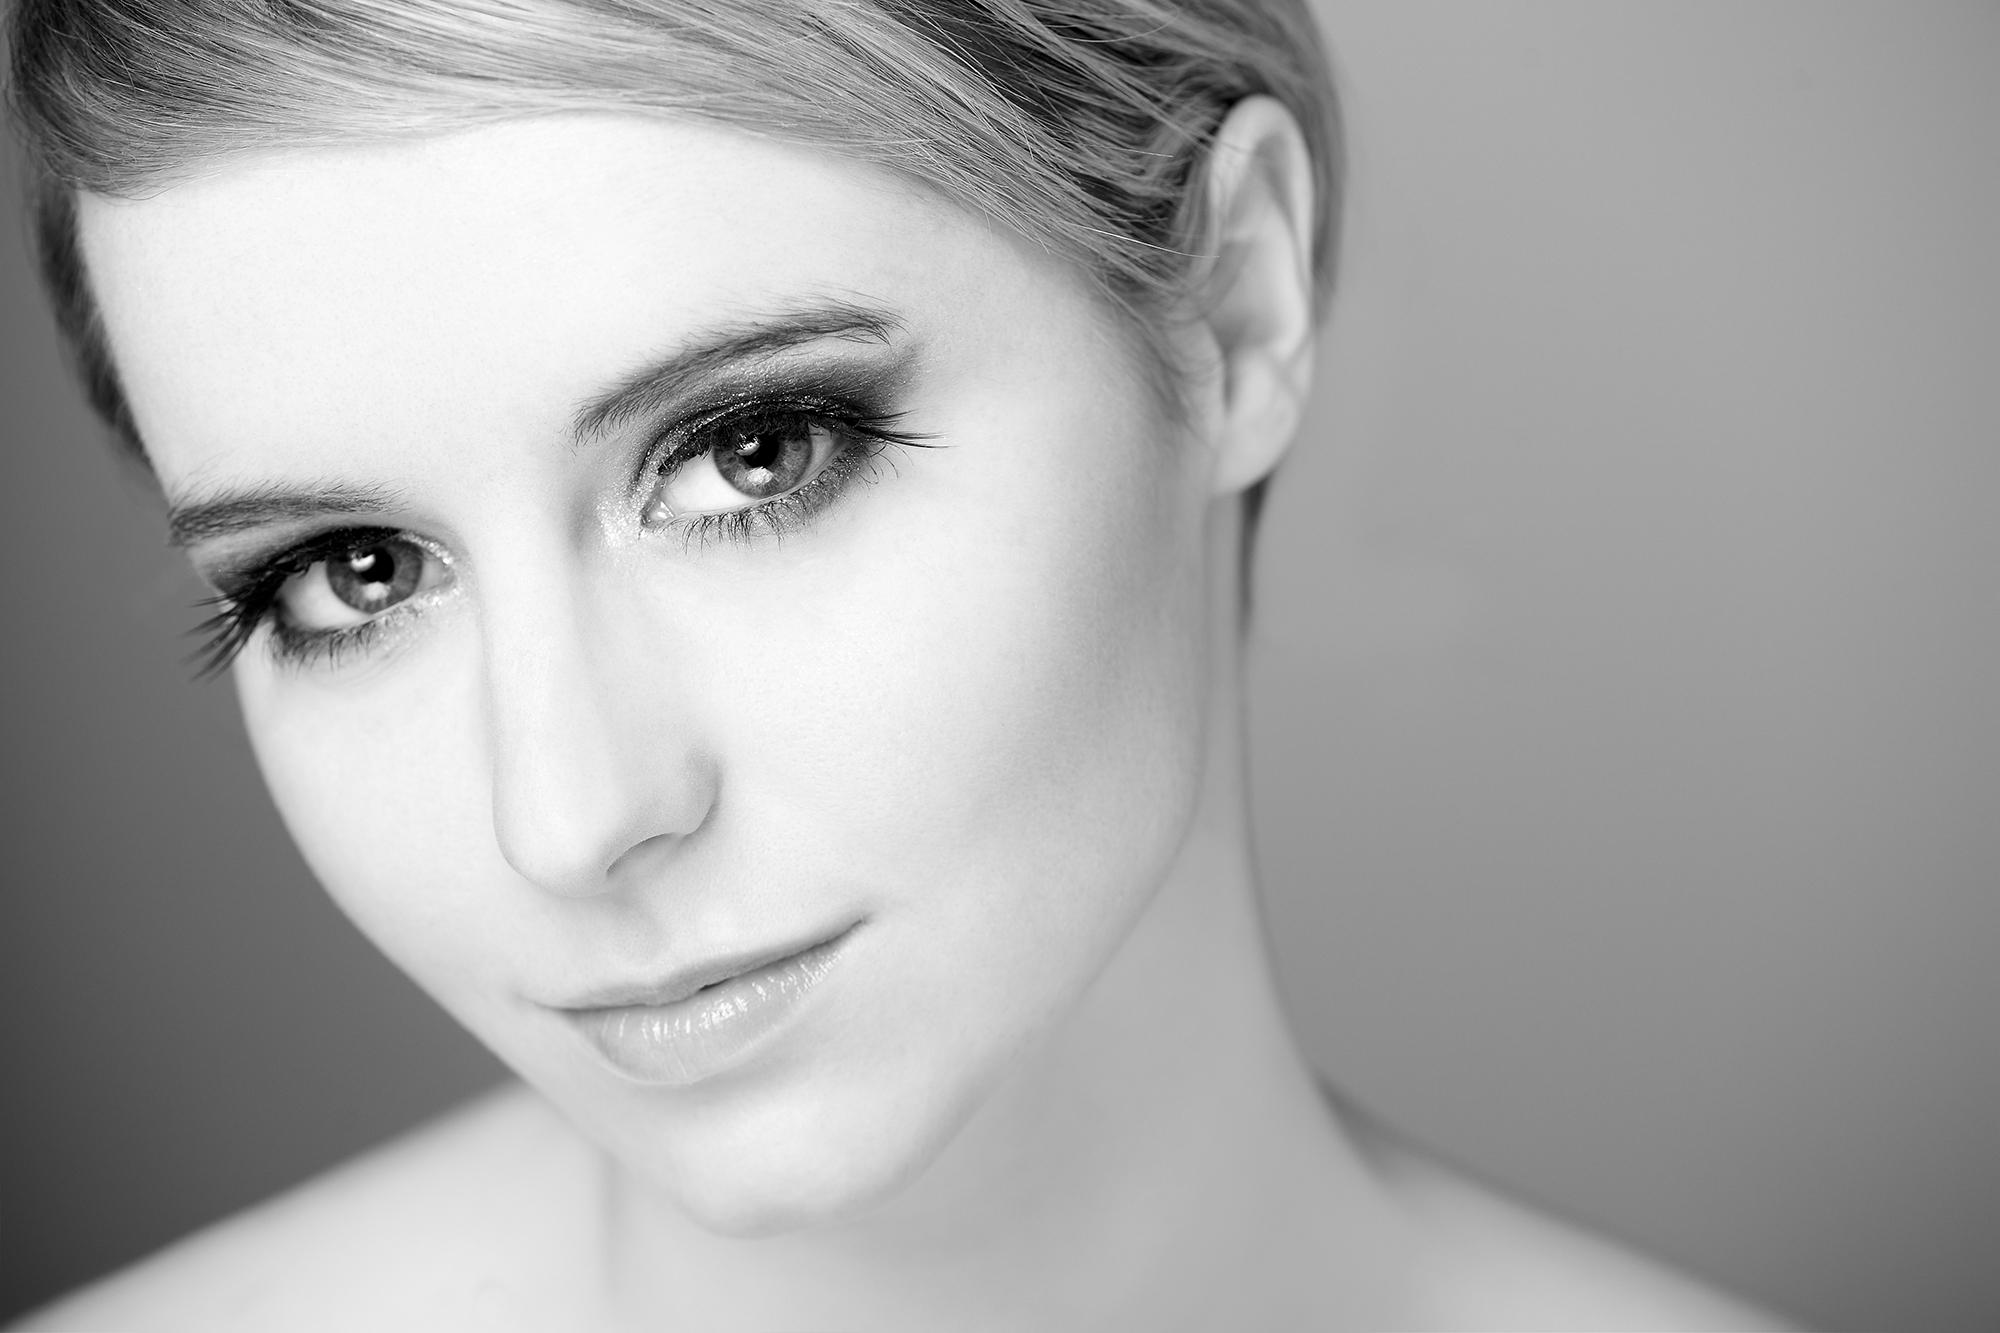 Black and white beauty portrait